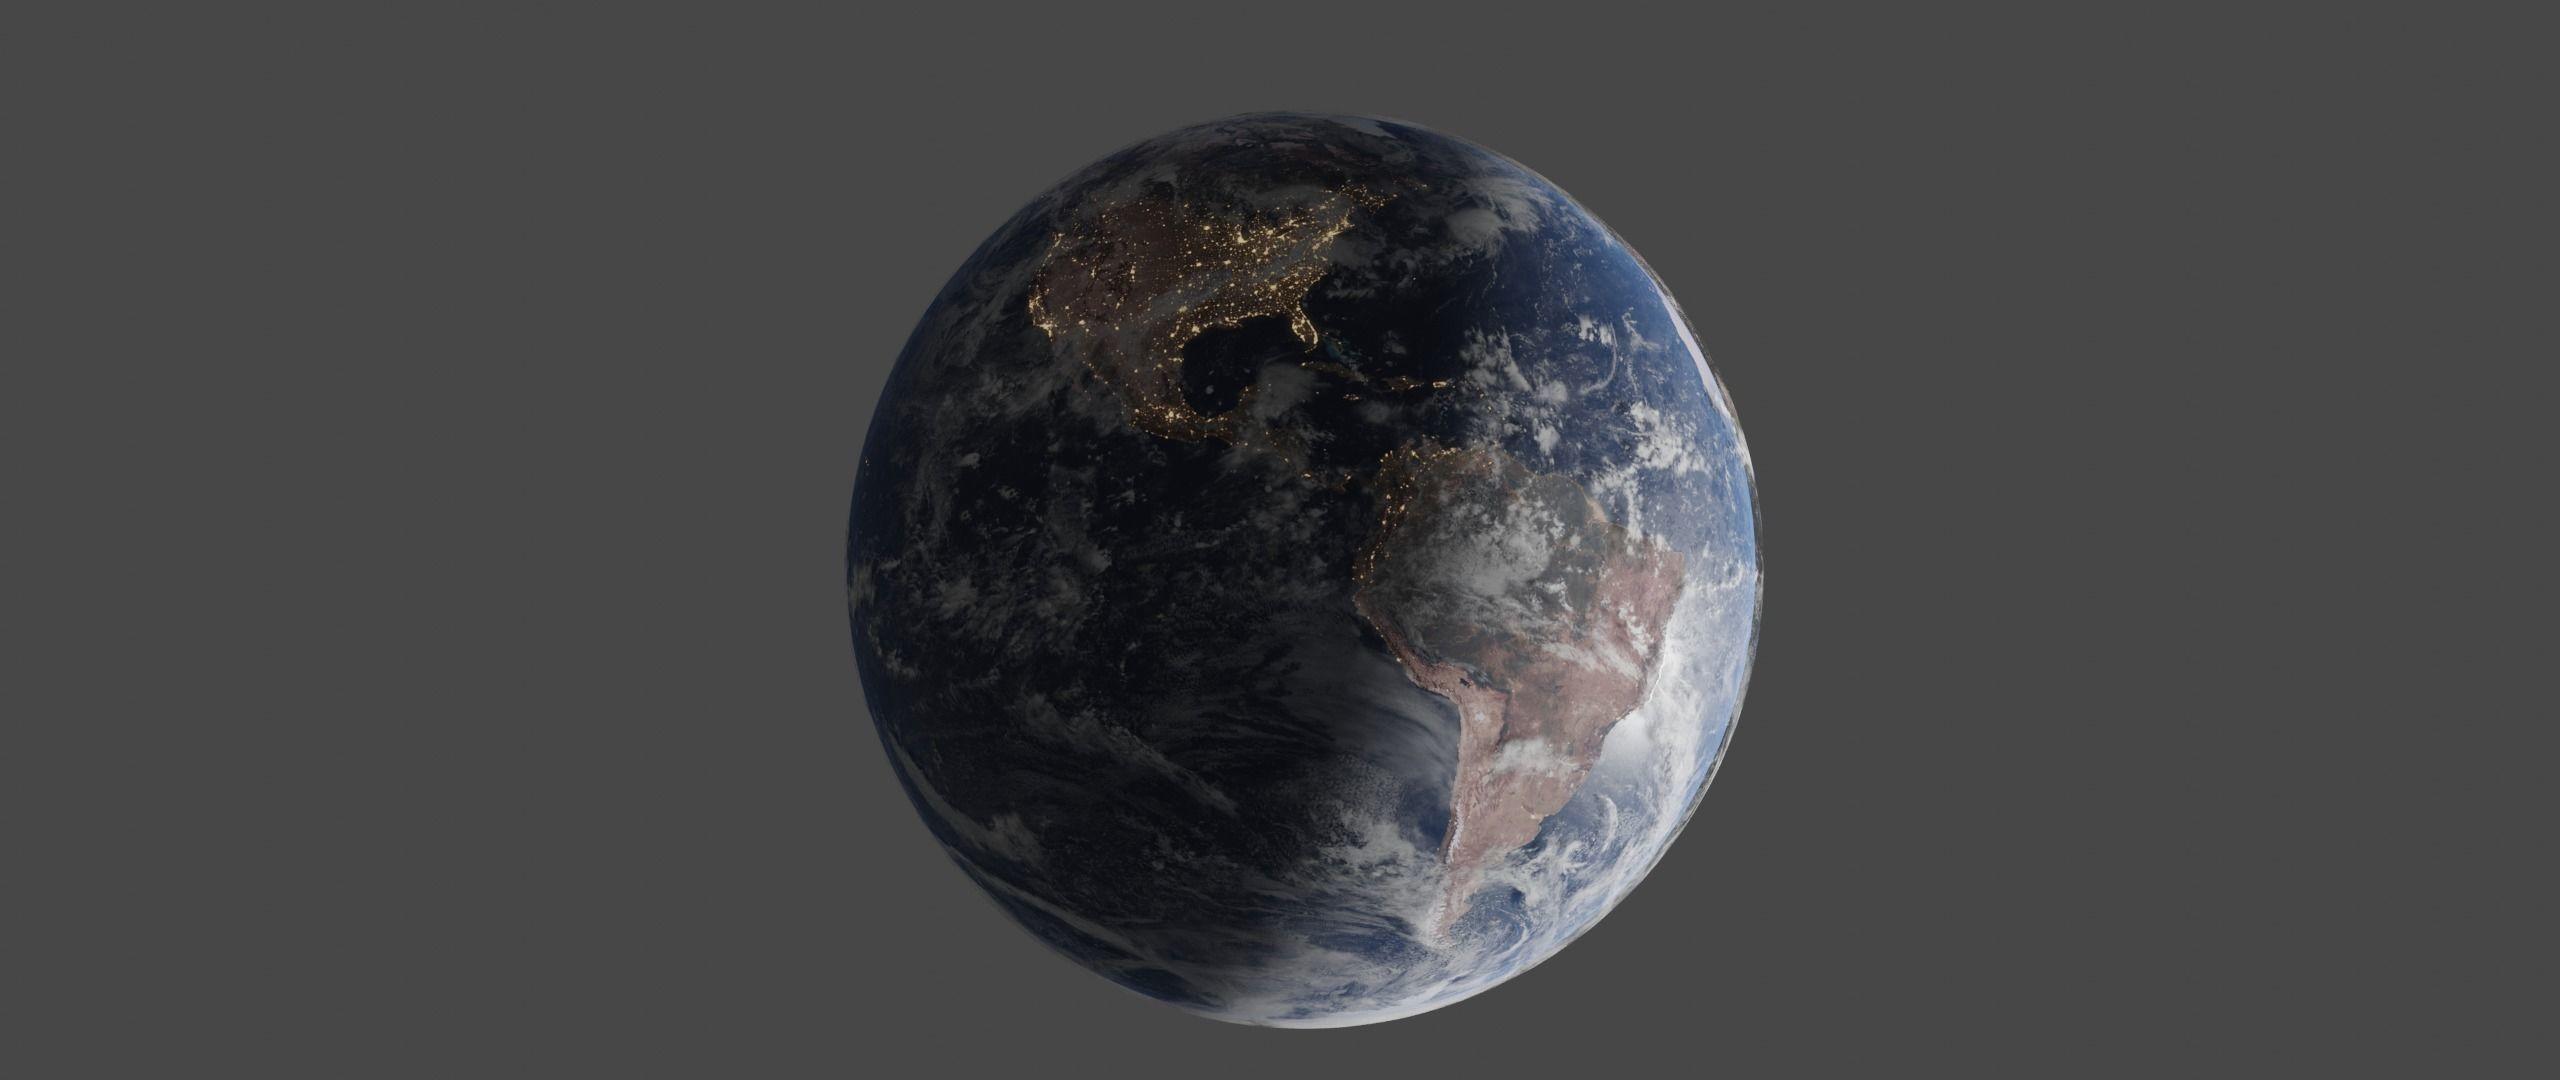 photorealistic earth